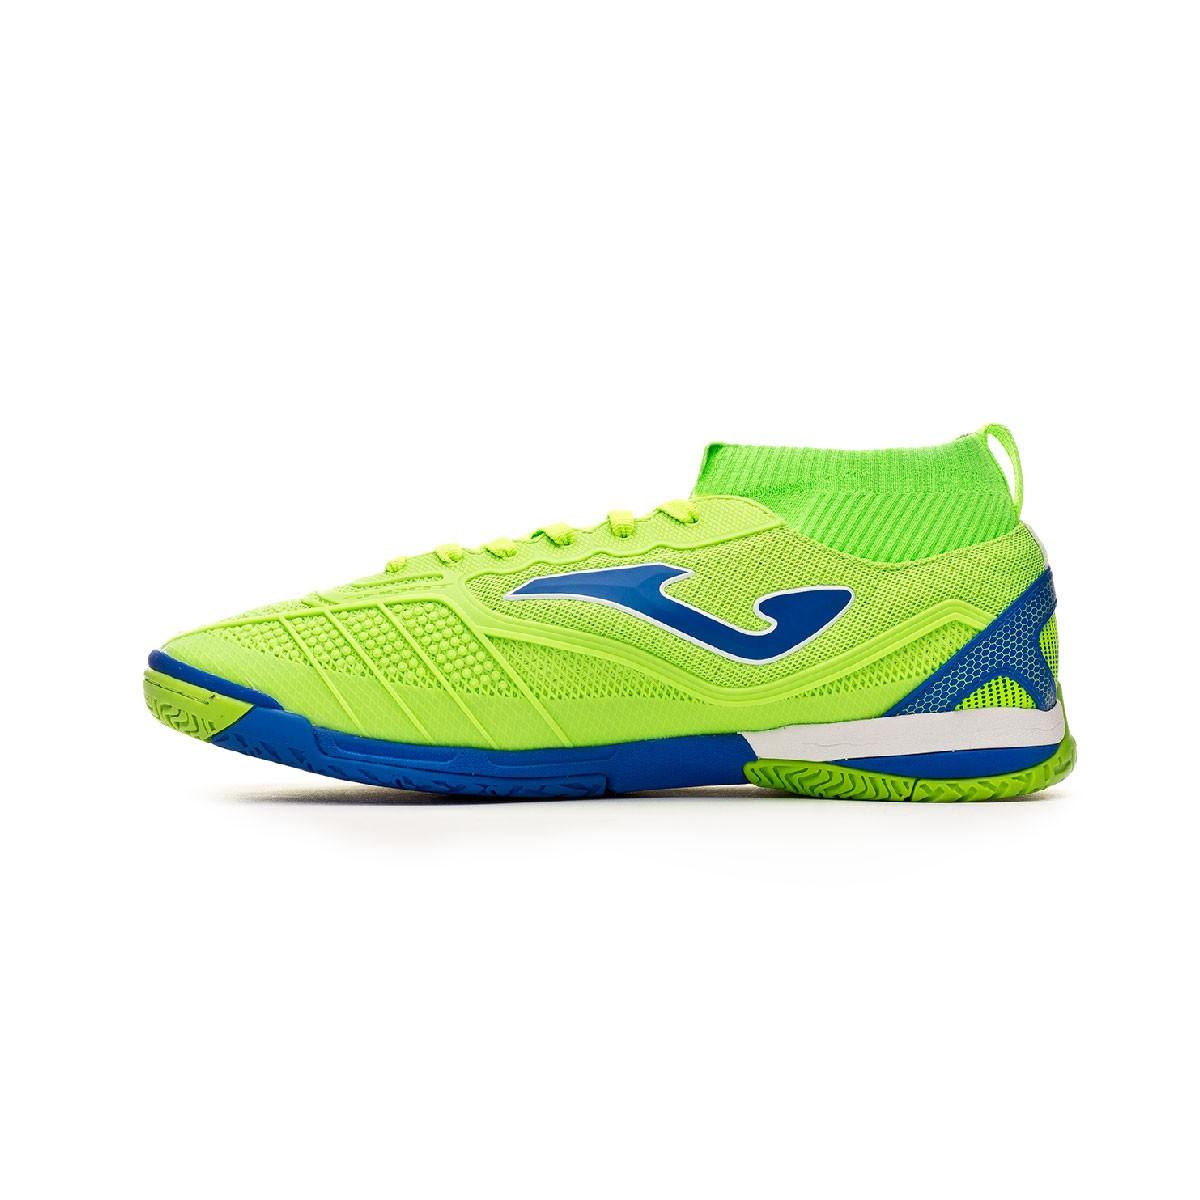 6b460be6d Futsal Boot Joma Tactico IN Green - Football store Fútbol Emotion